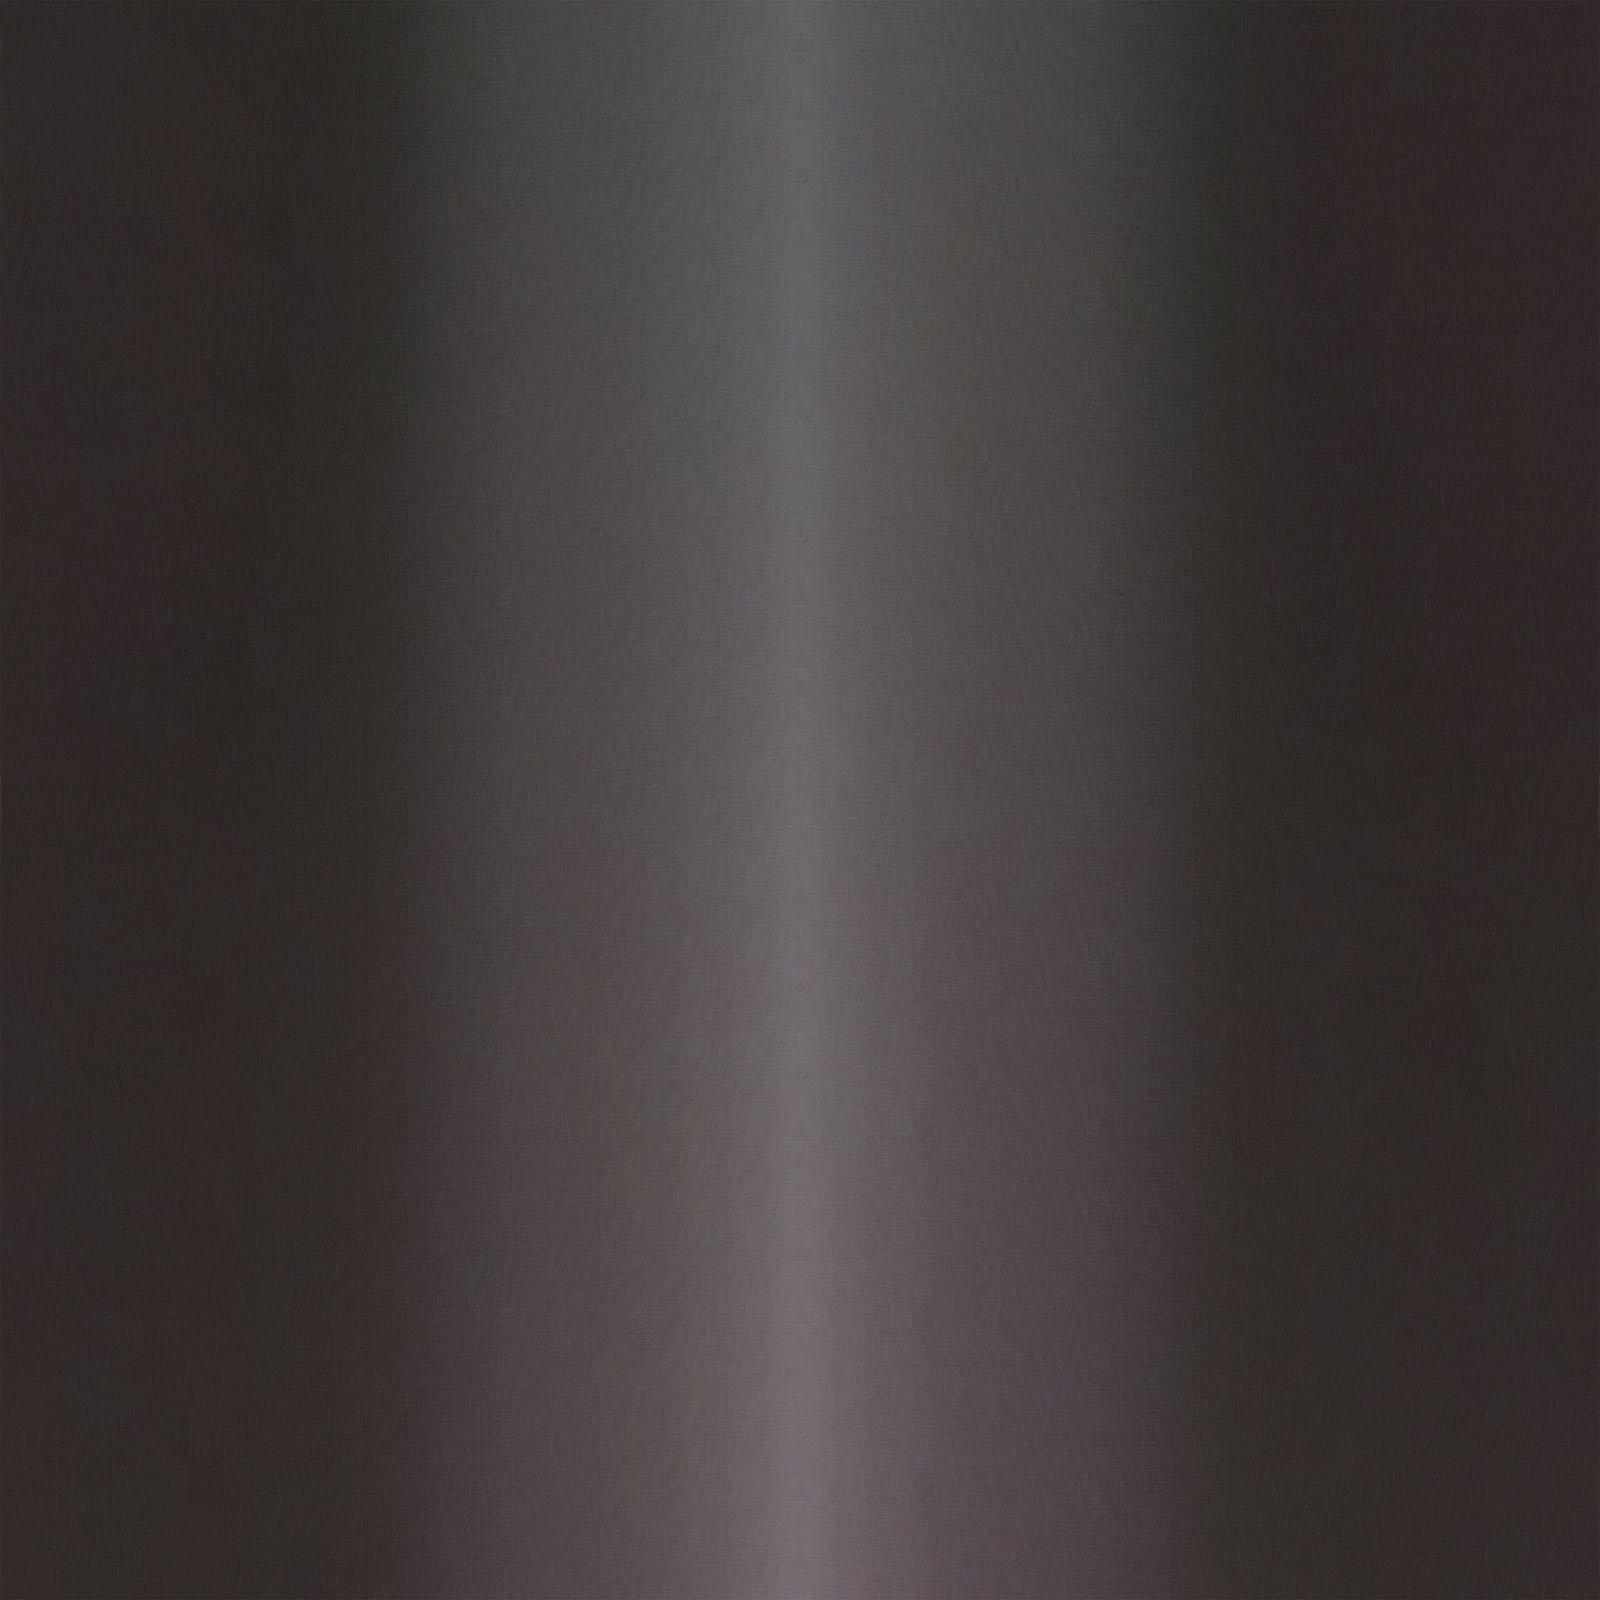 EESC-11216 JK - GELATO OMBRE BY MAYWOOD BLACK TONAL